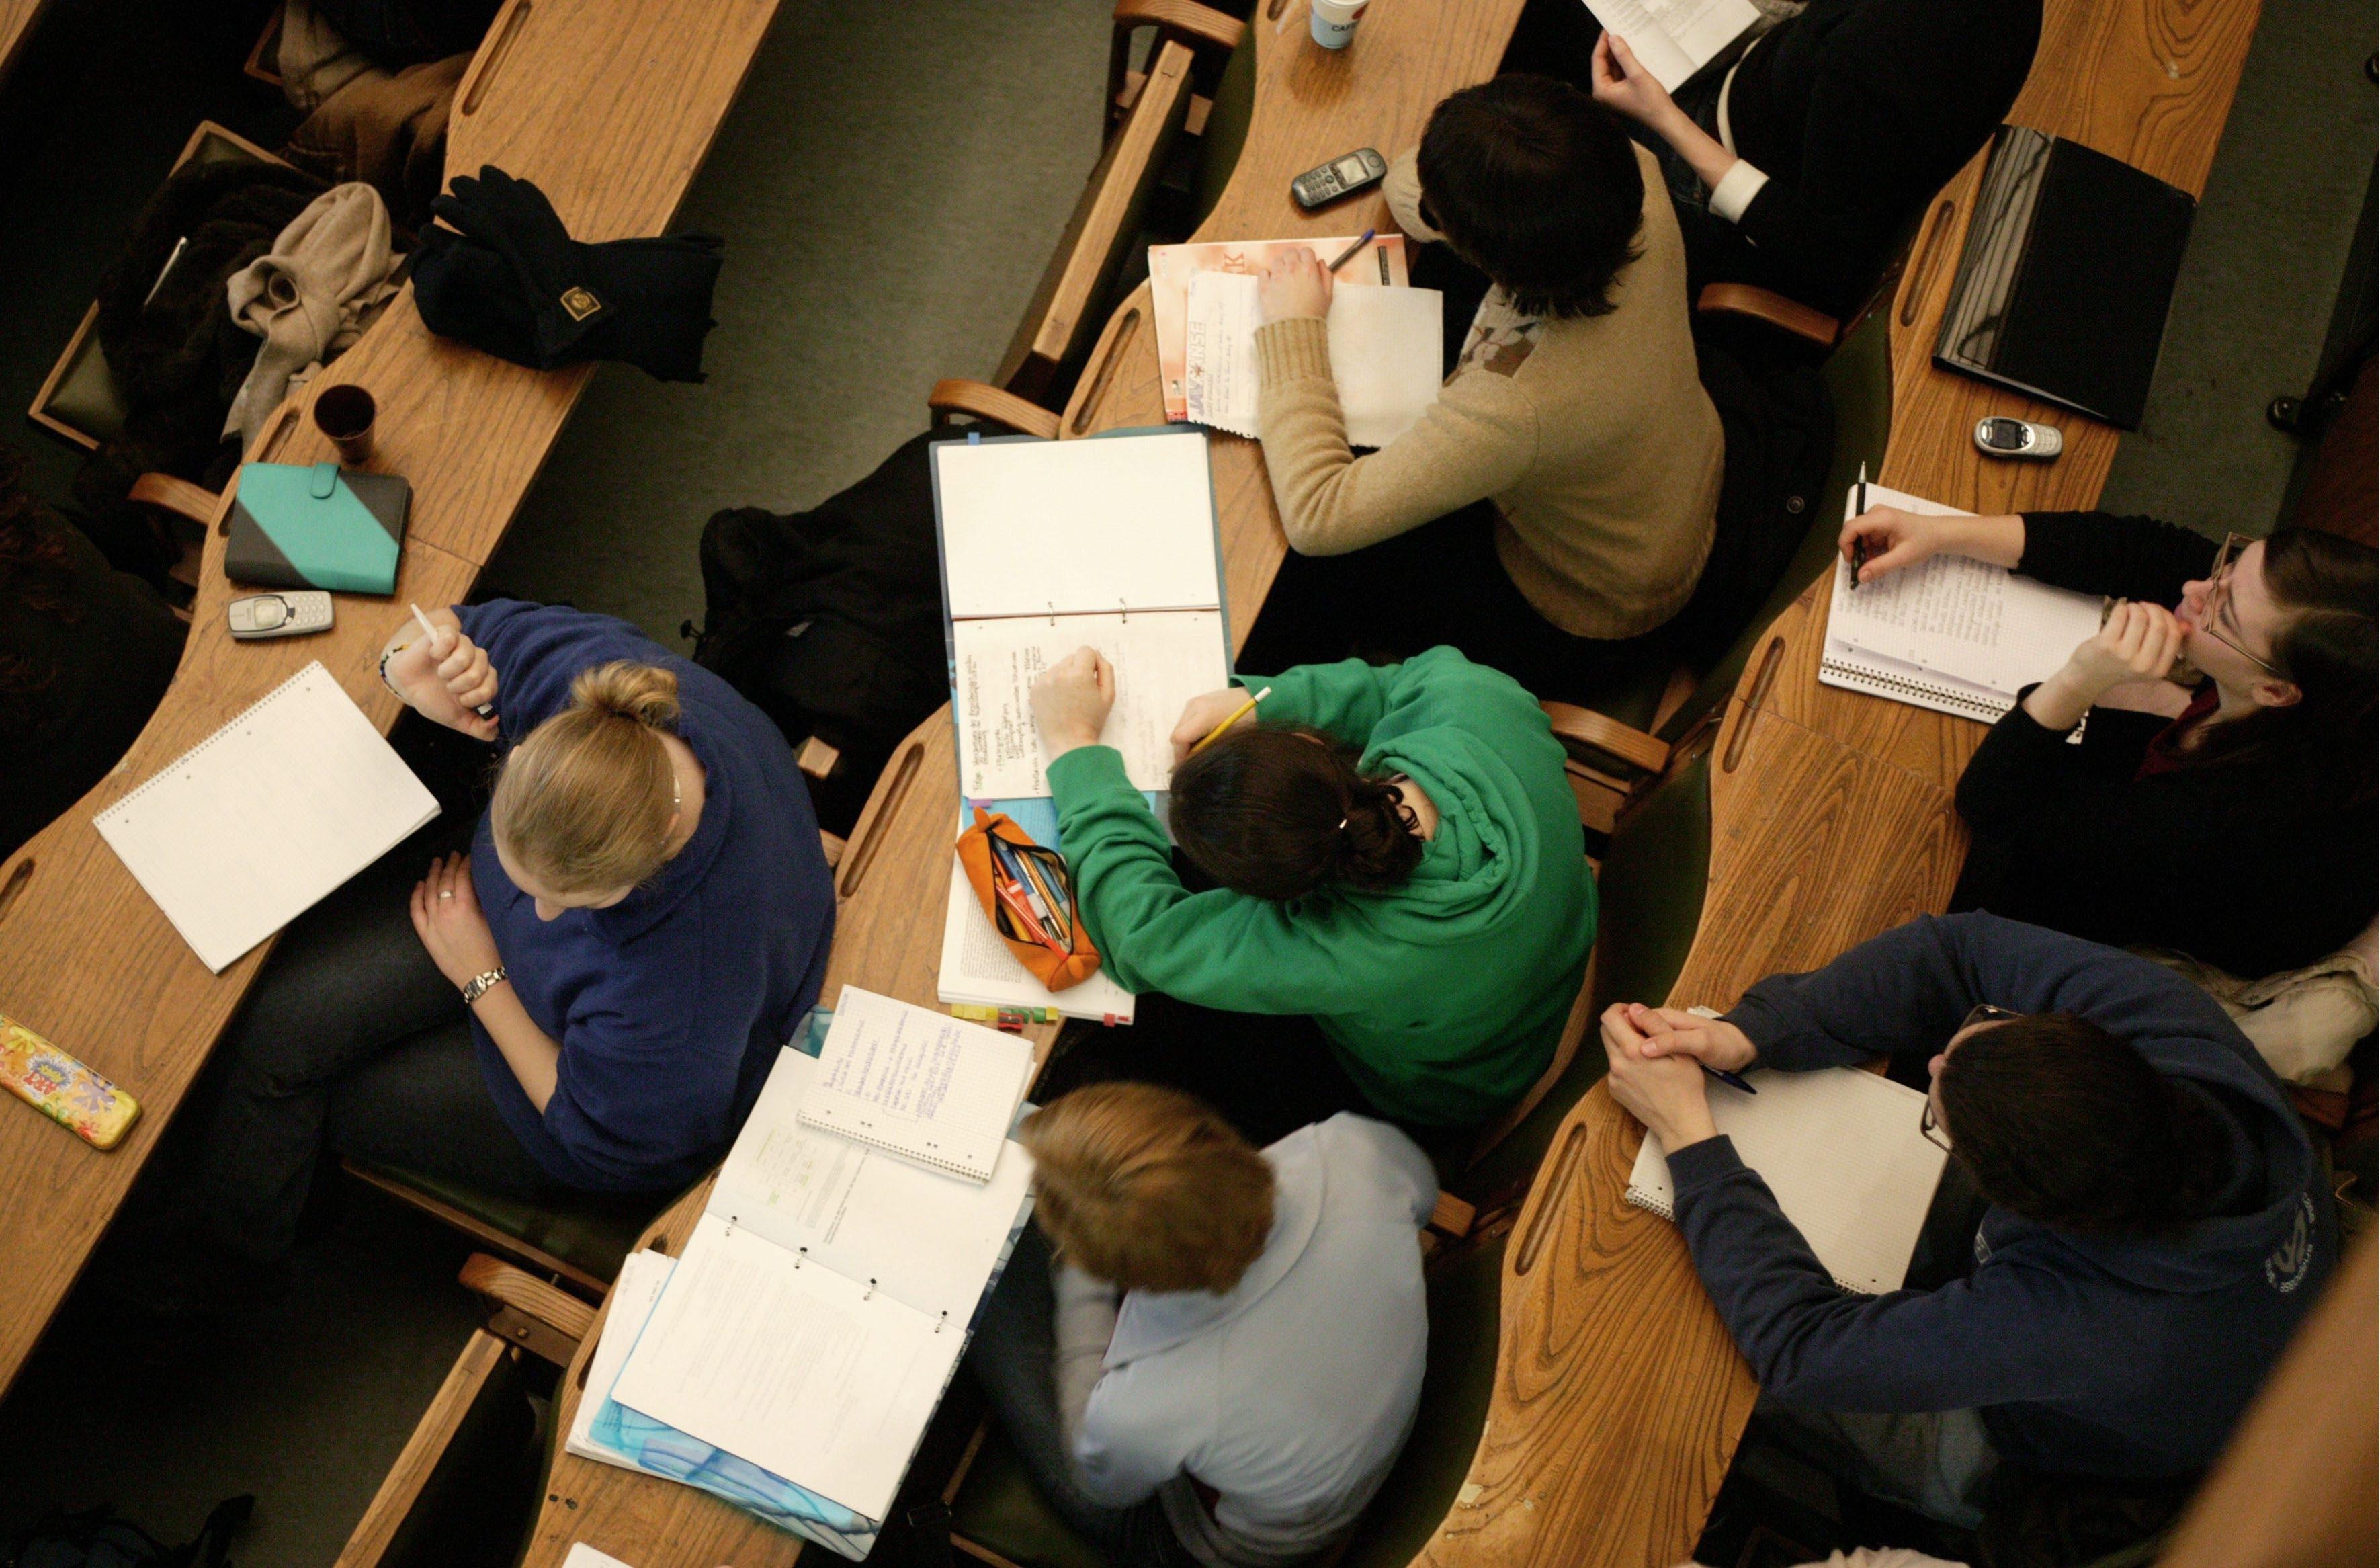 Students inside lecture hall of the Rheinische Friedrich Wilhelms University of Bonn.